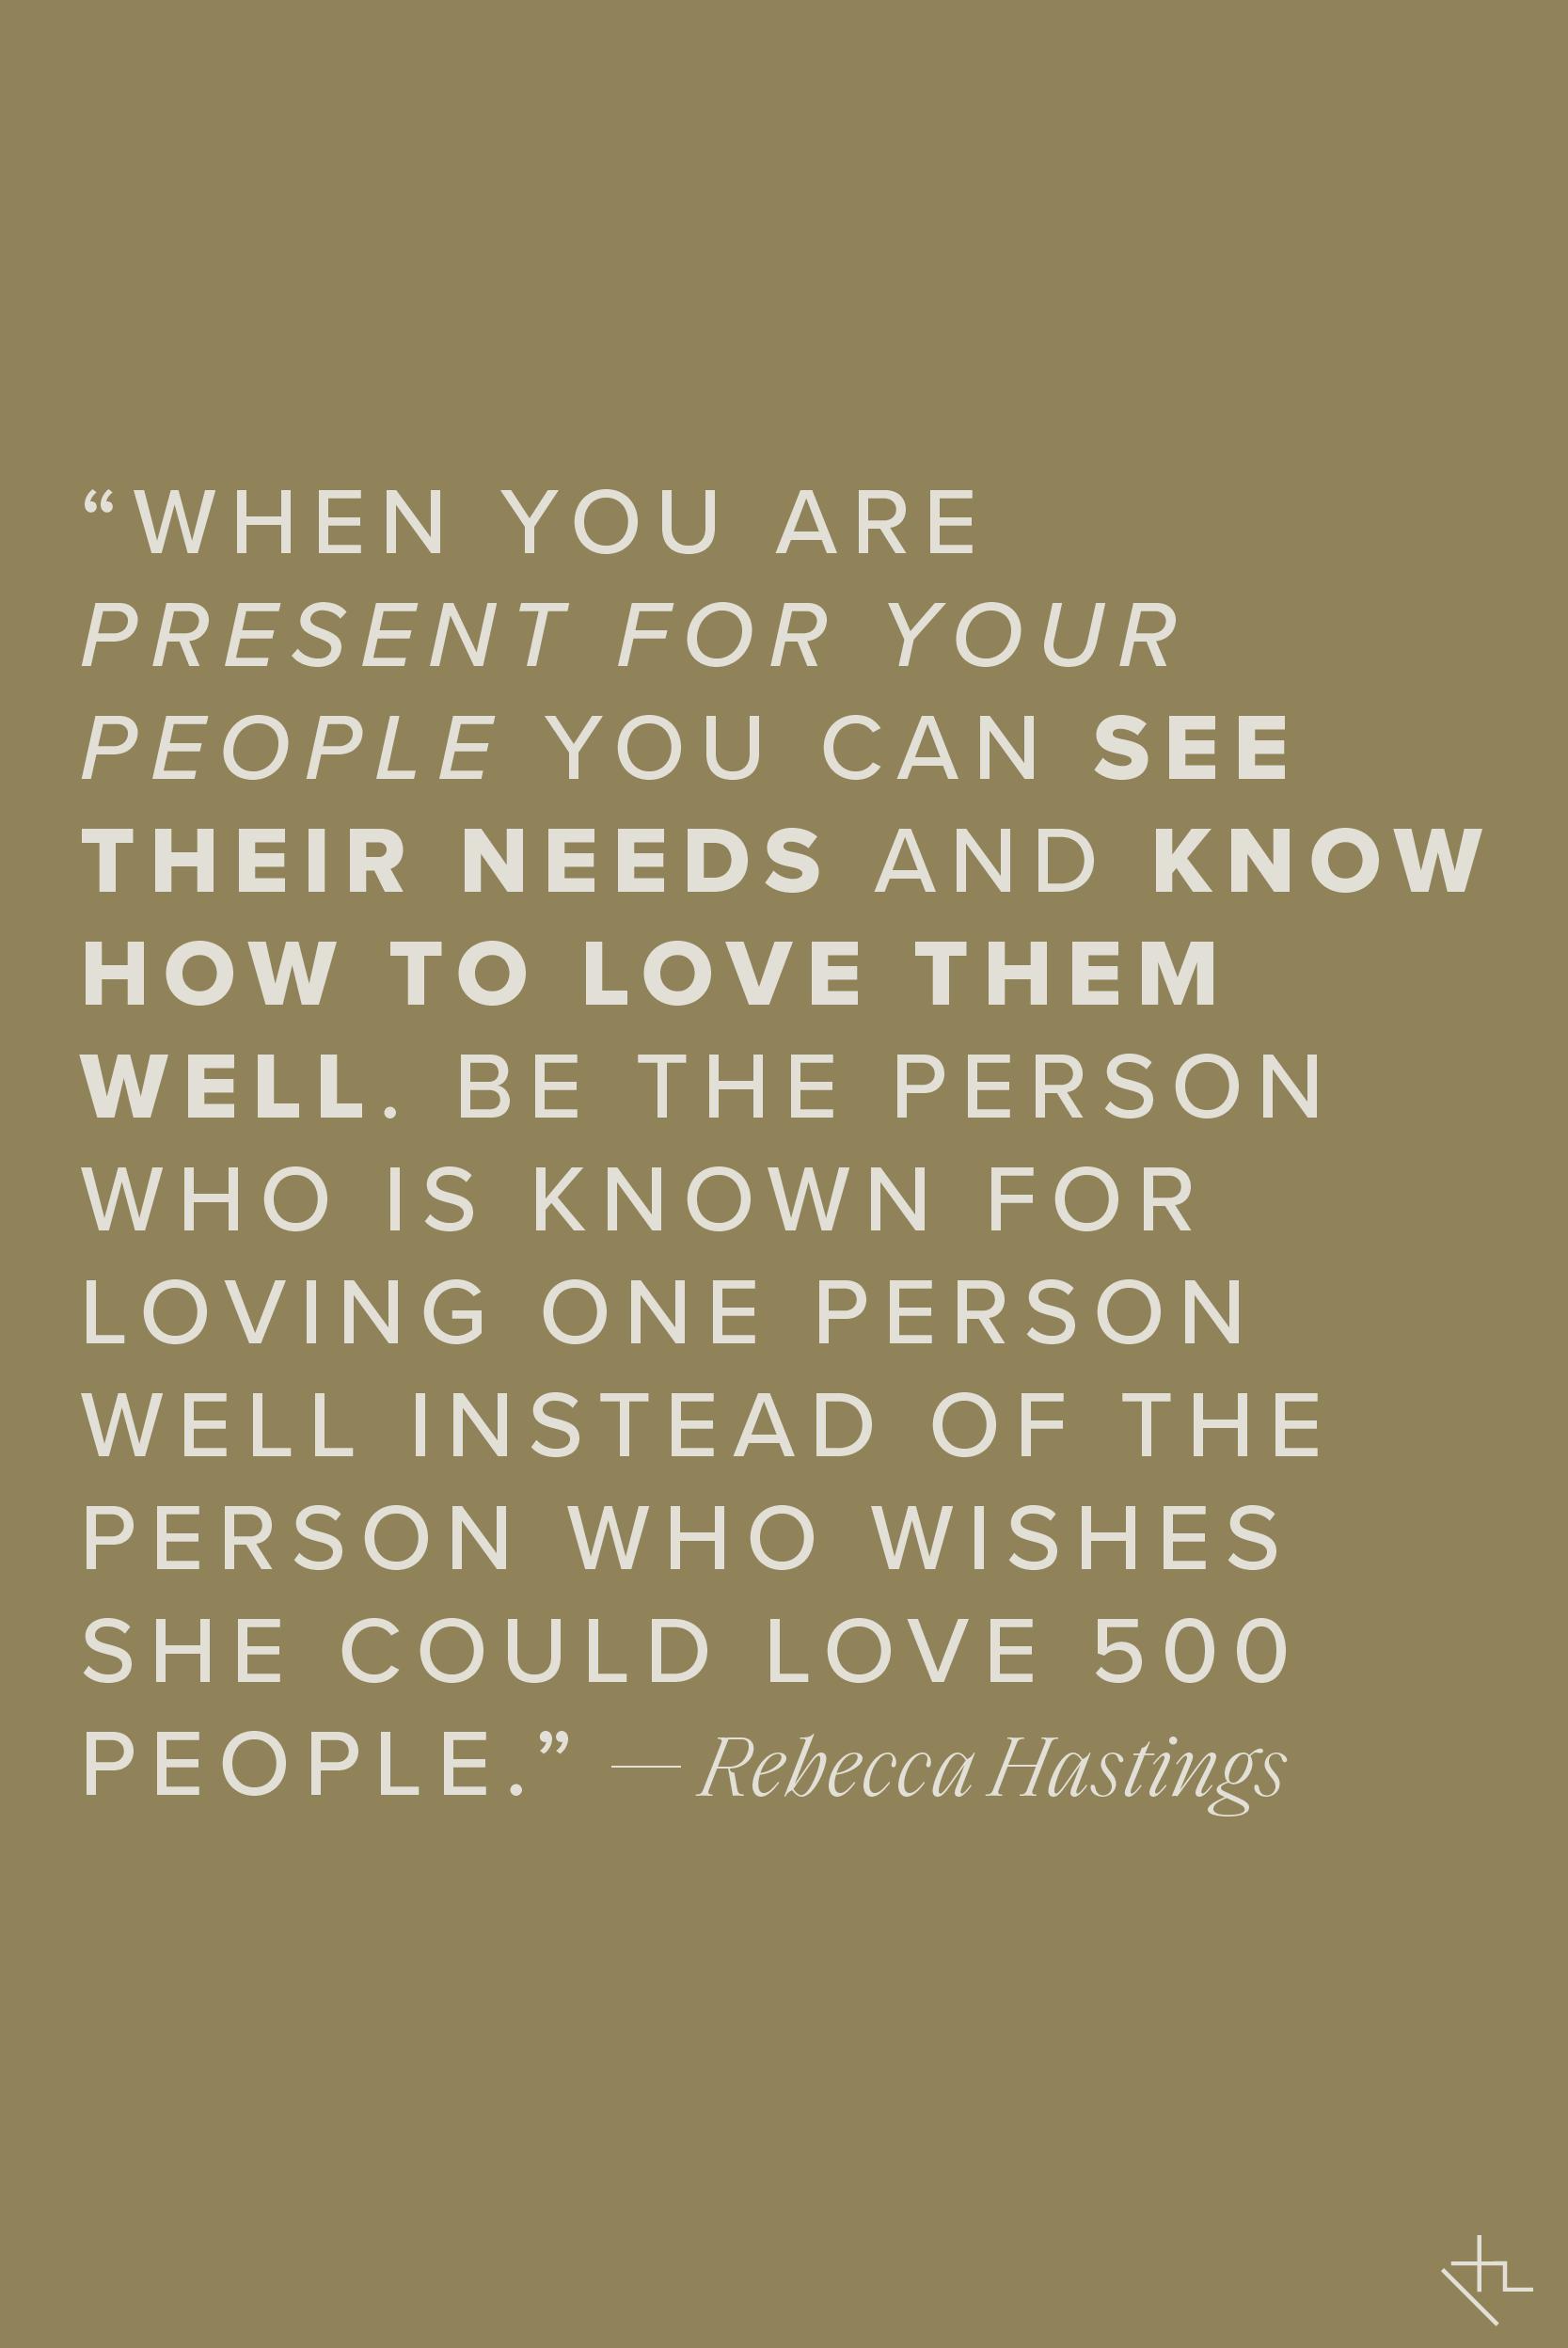 Rebecca Hastings - Pinterest Image